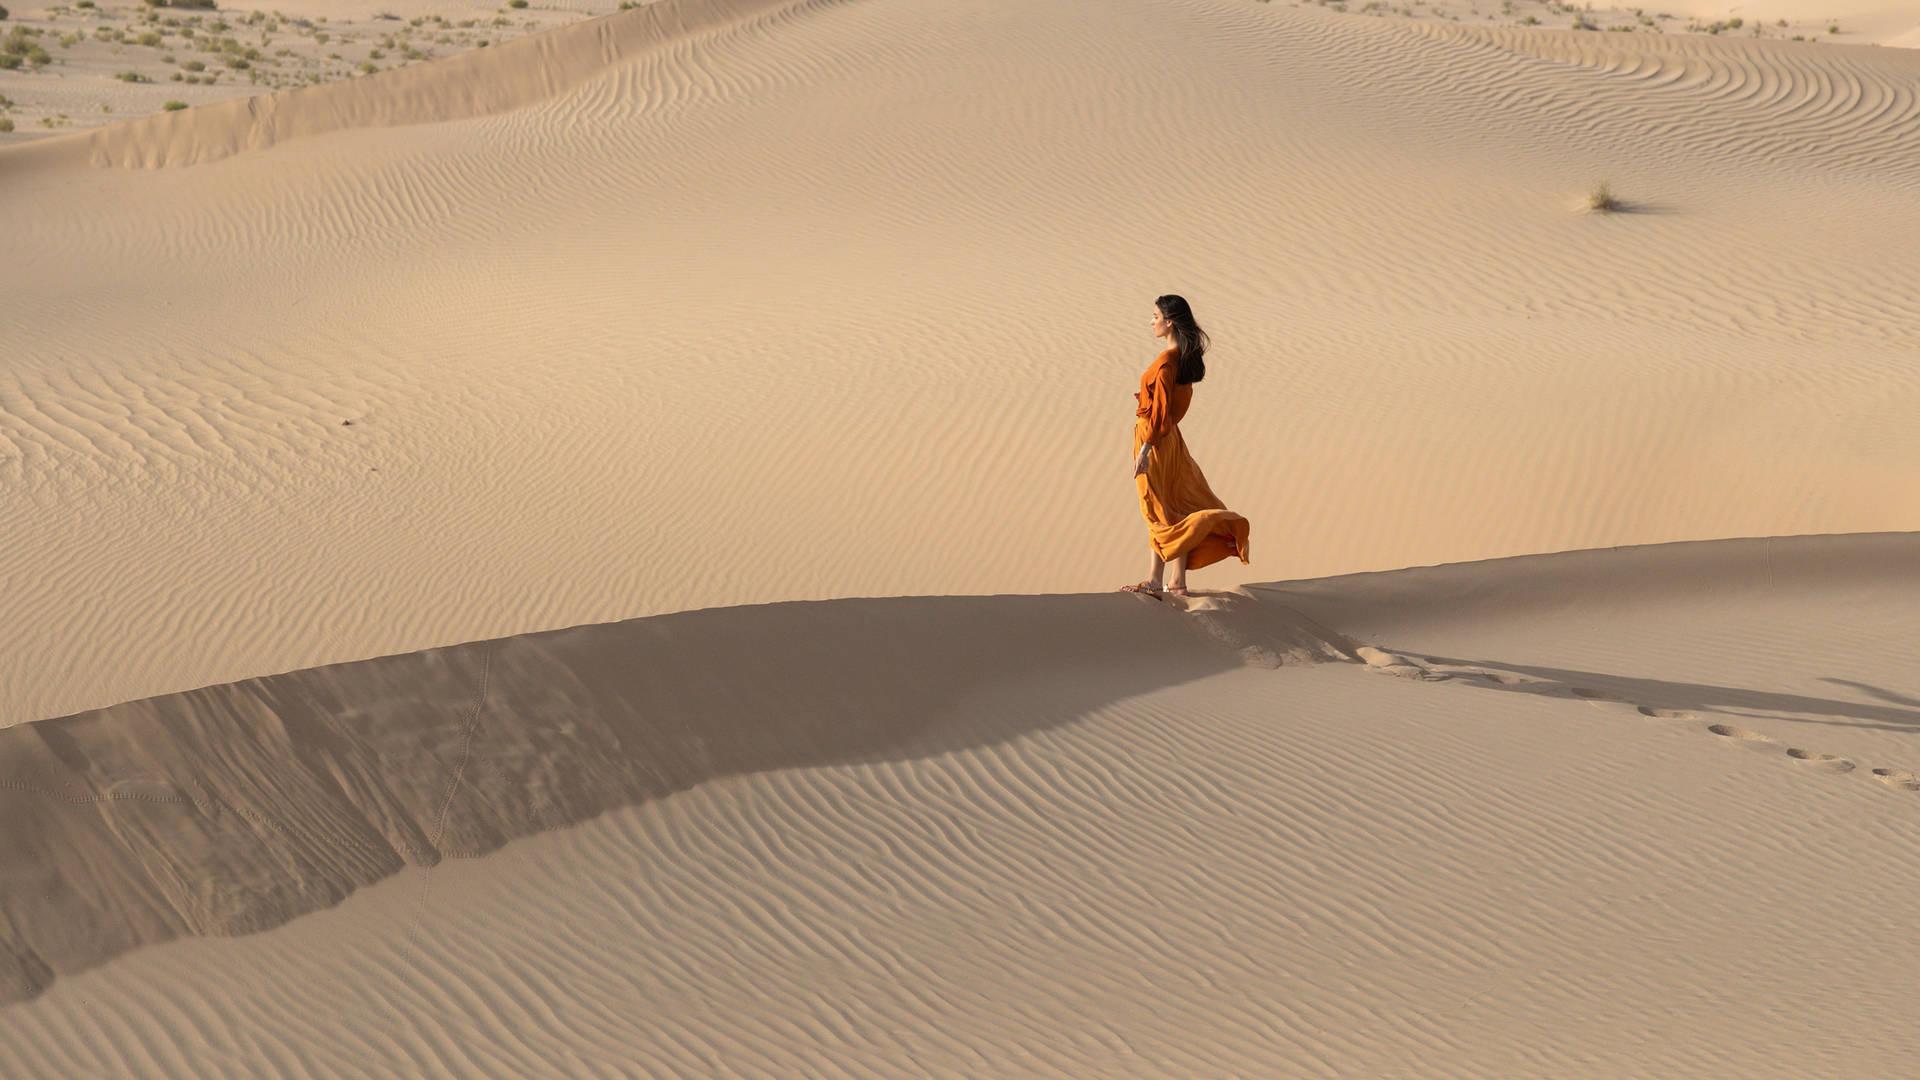 Frau auf einer Düne